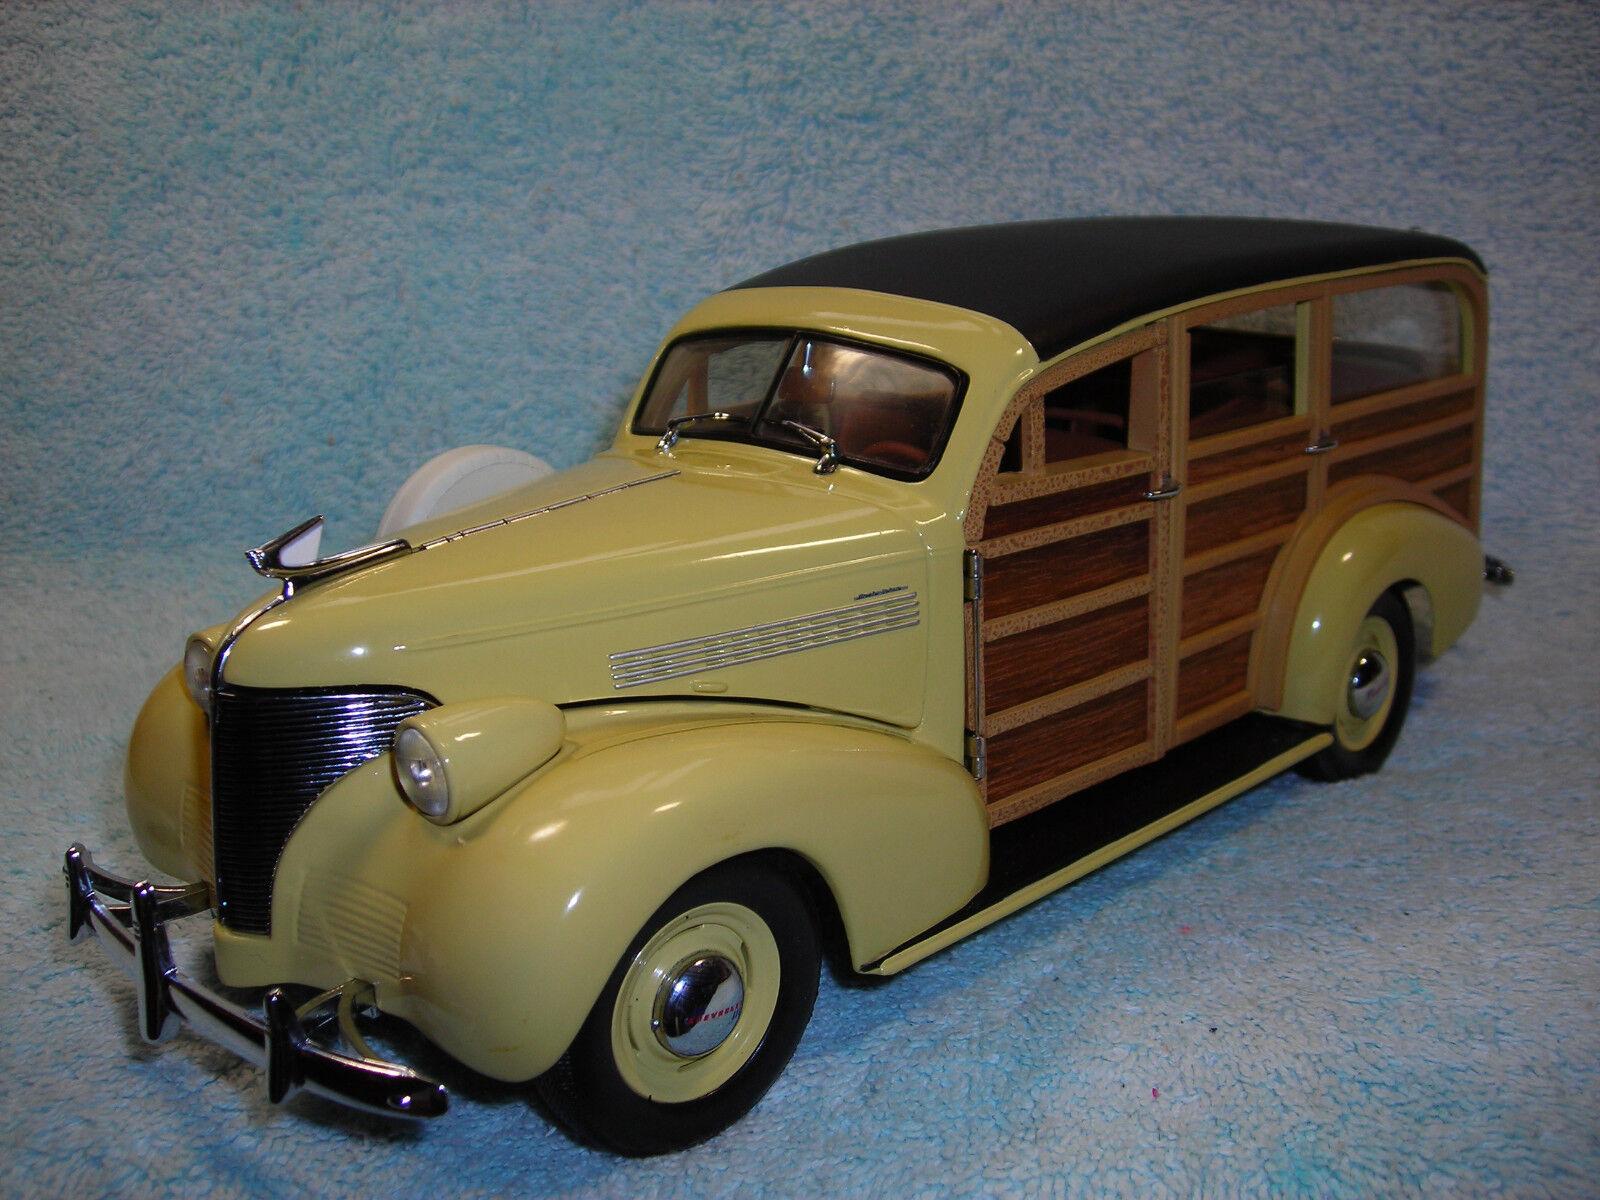 1 18 1939 CHEVY WOODY WAGON EN JAUNE \ bois véritable par MOTOR CITY CLASSICS.